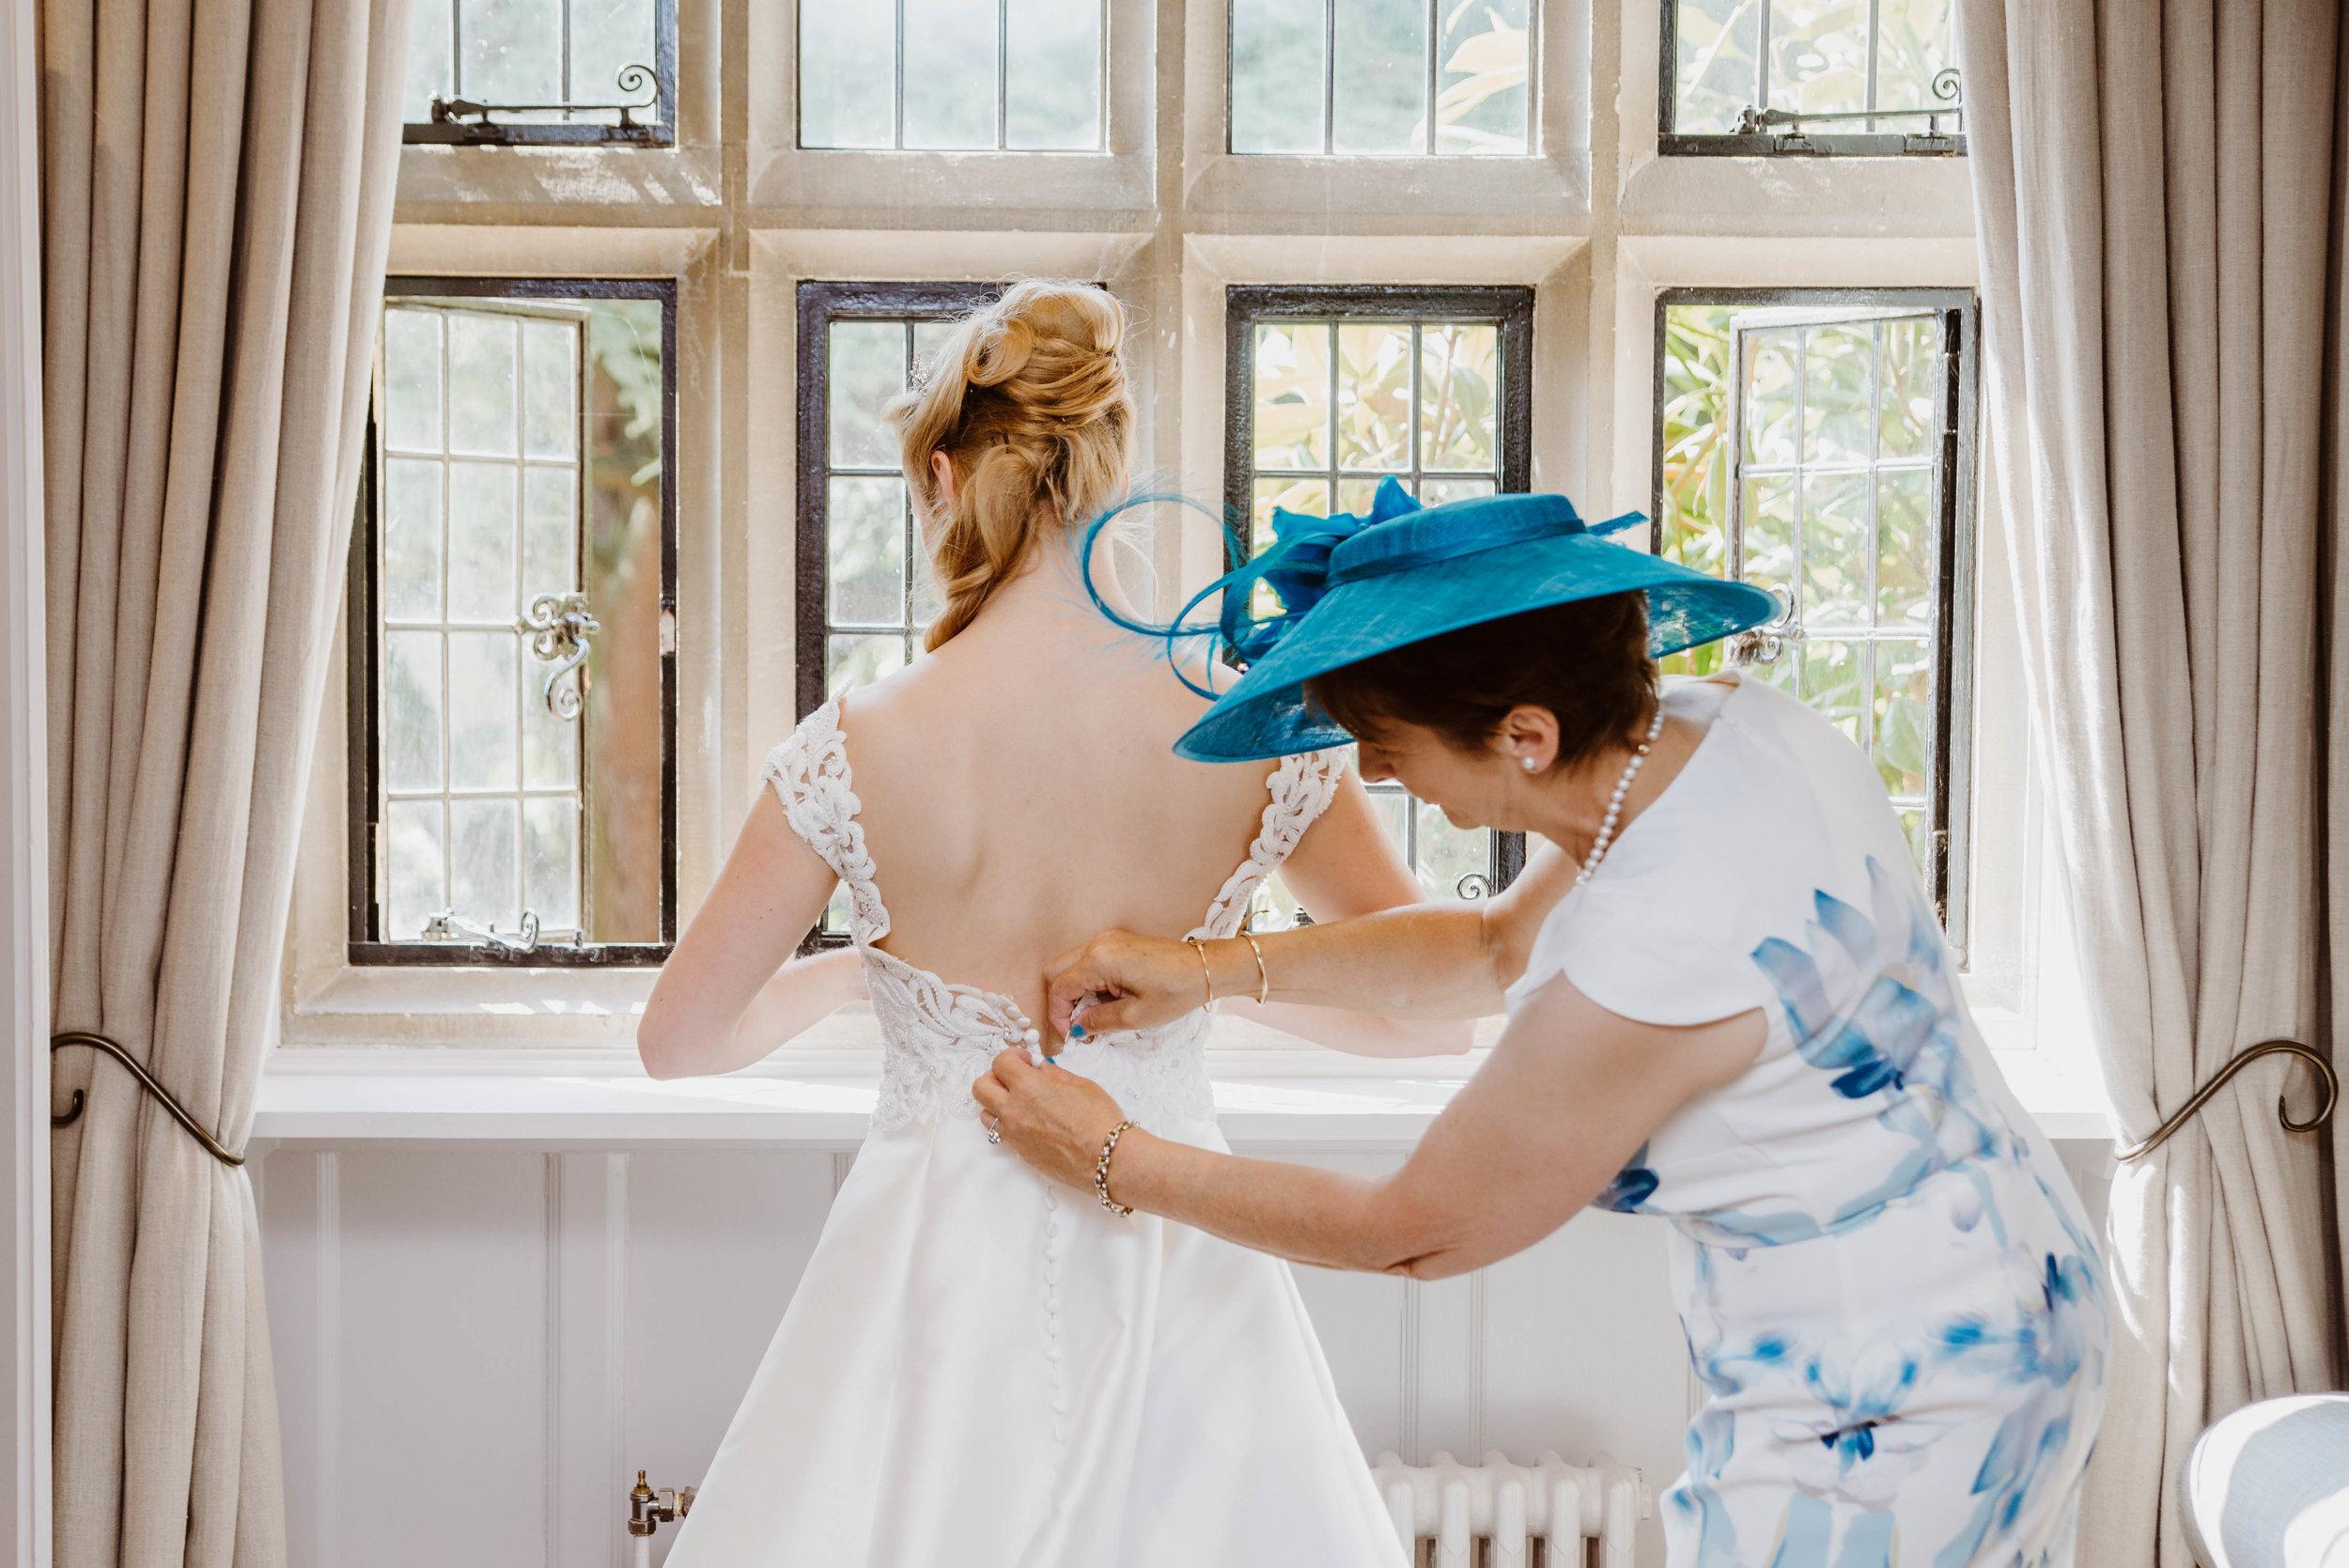 Konjo-Photography-and-videography-suffolk-wedding-photographer-videographer-lanwades-hall-newmarket (3).jpg